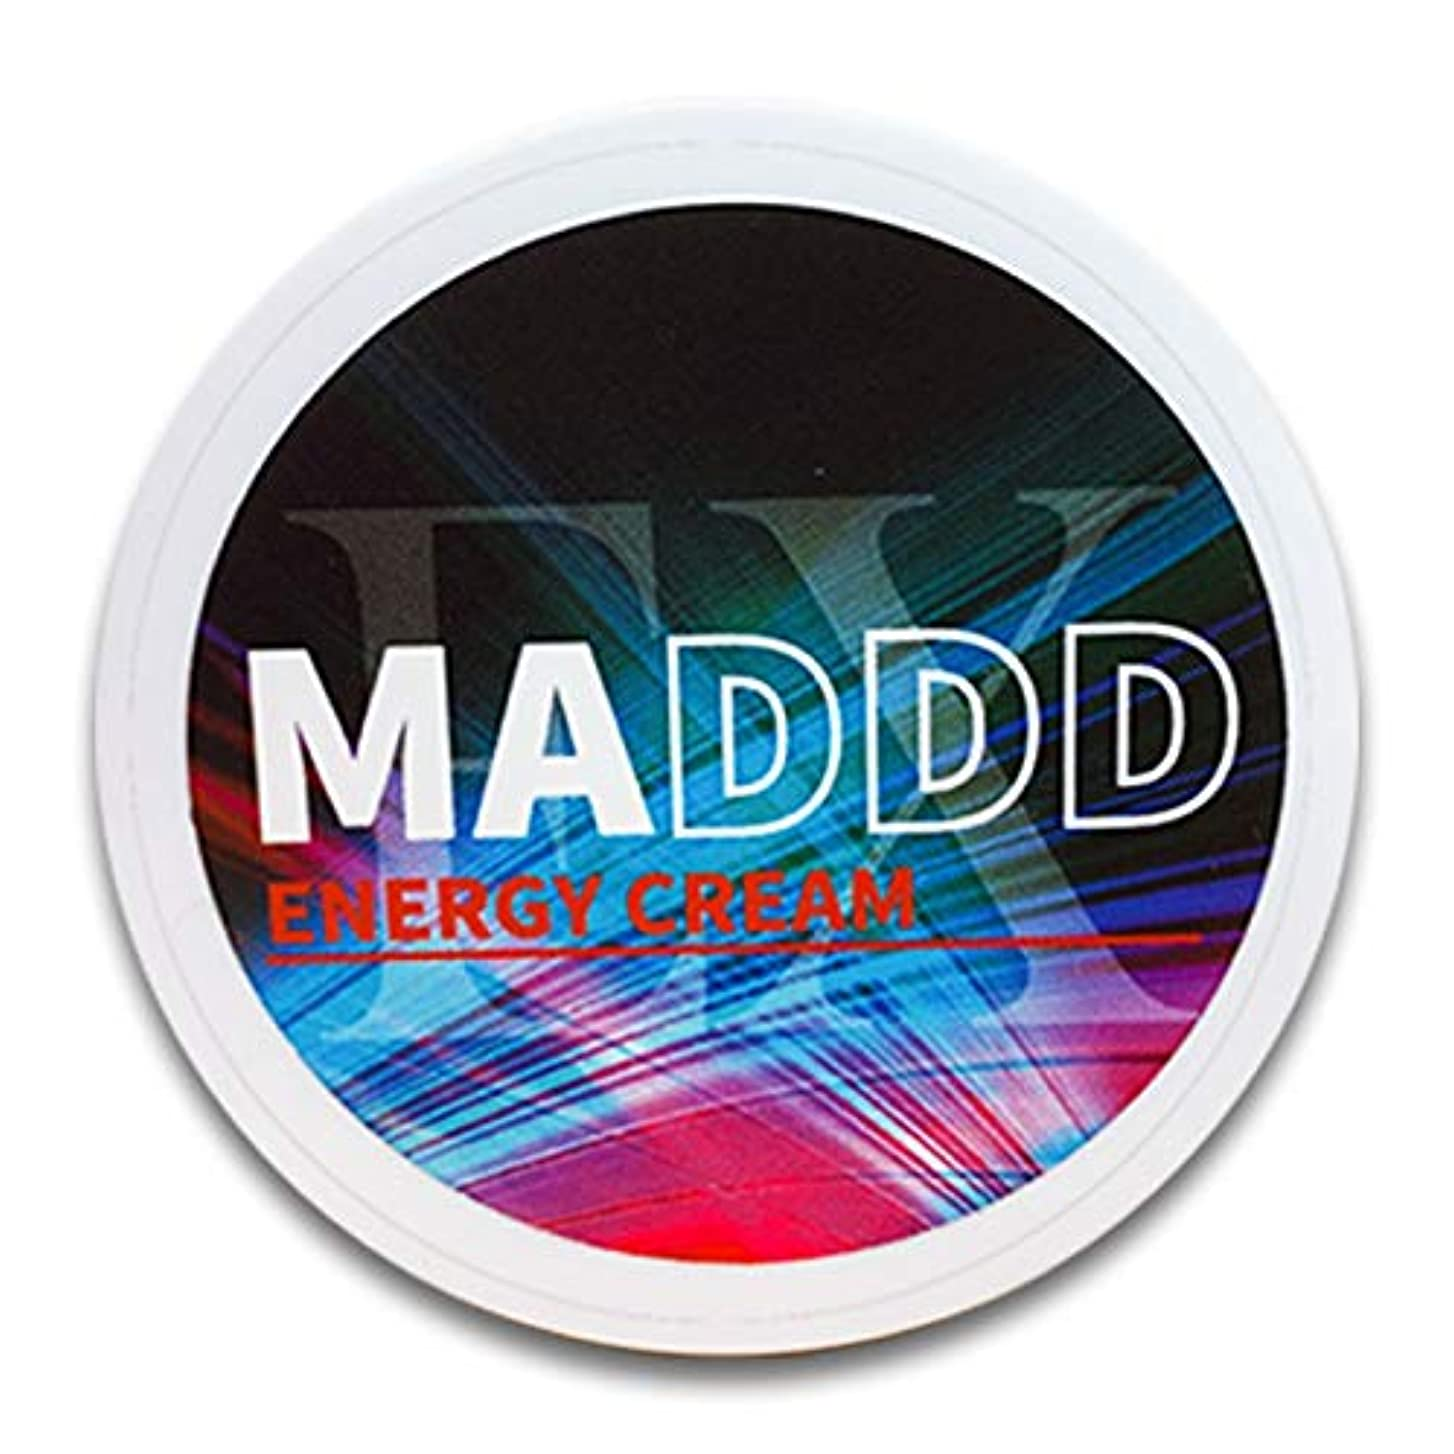 彼女の鉛下着MADDD EX 増大クリーム 自信 持続力 厳選成分 50g (単品購入)